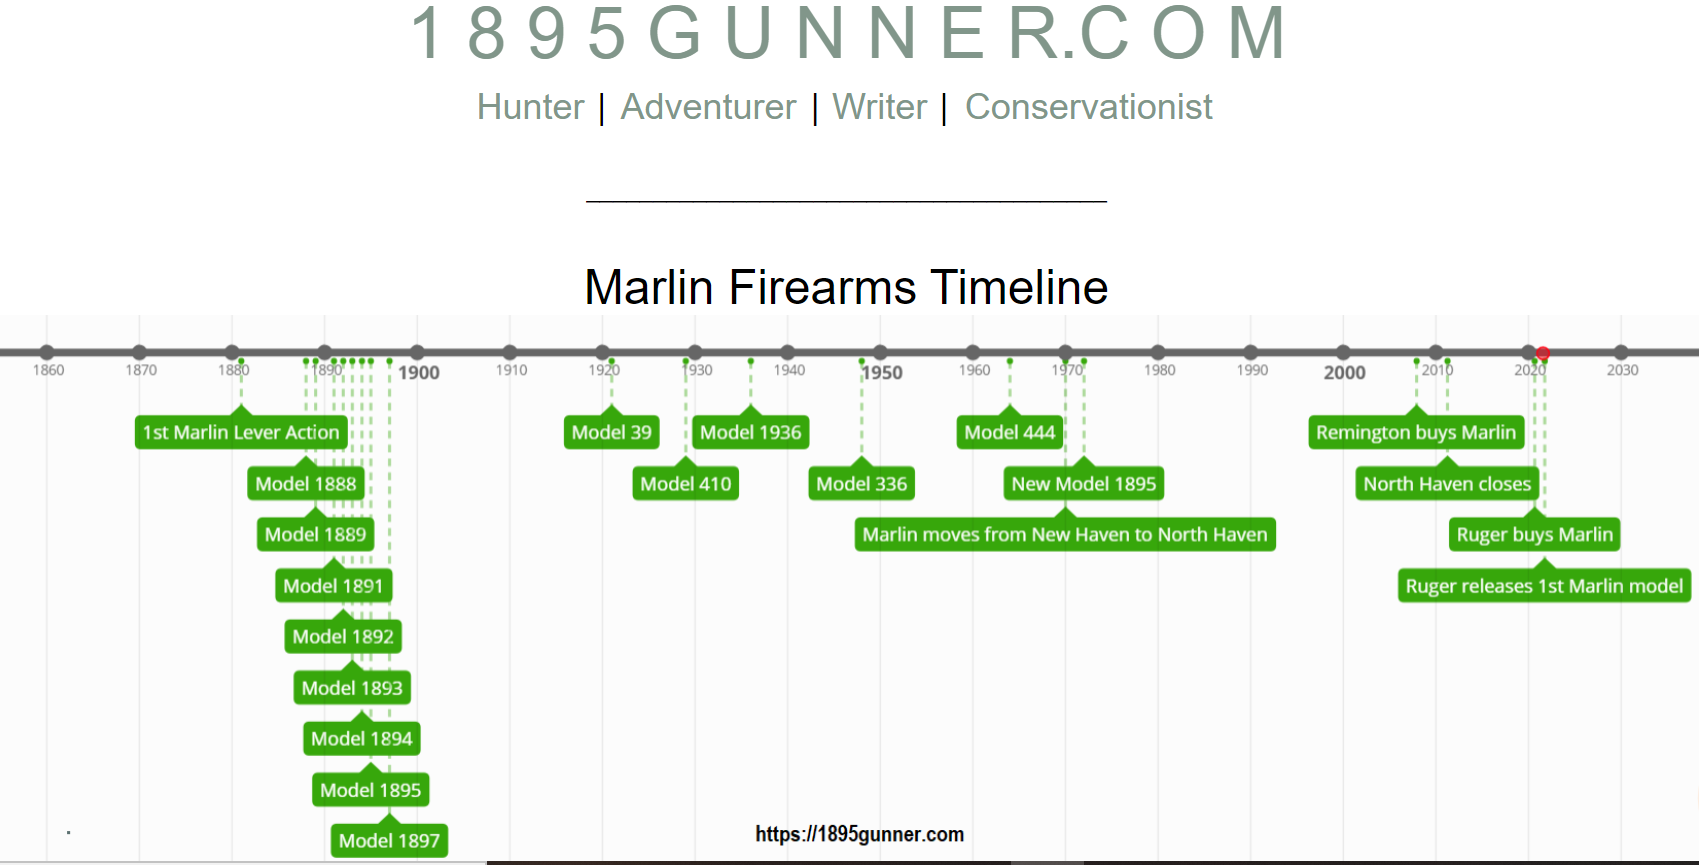 The Marlin Firearms Timeline